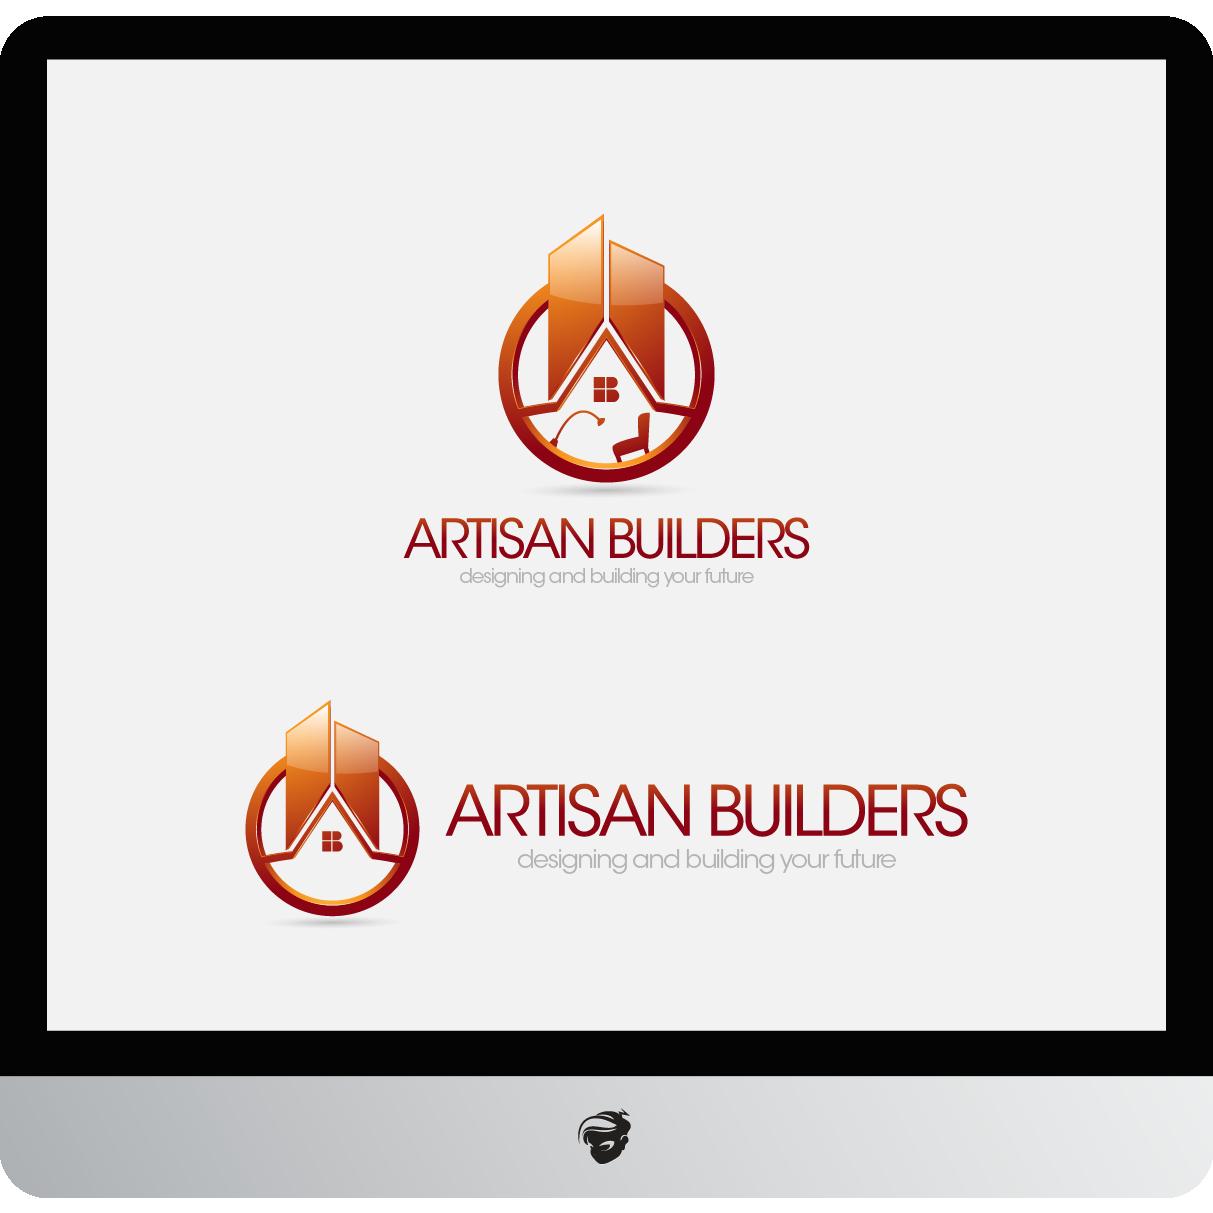 Logo Design by zesthar - Entry No. 230 in the Logo Design Contest Captivating Logo Design for Artisan Builders.